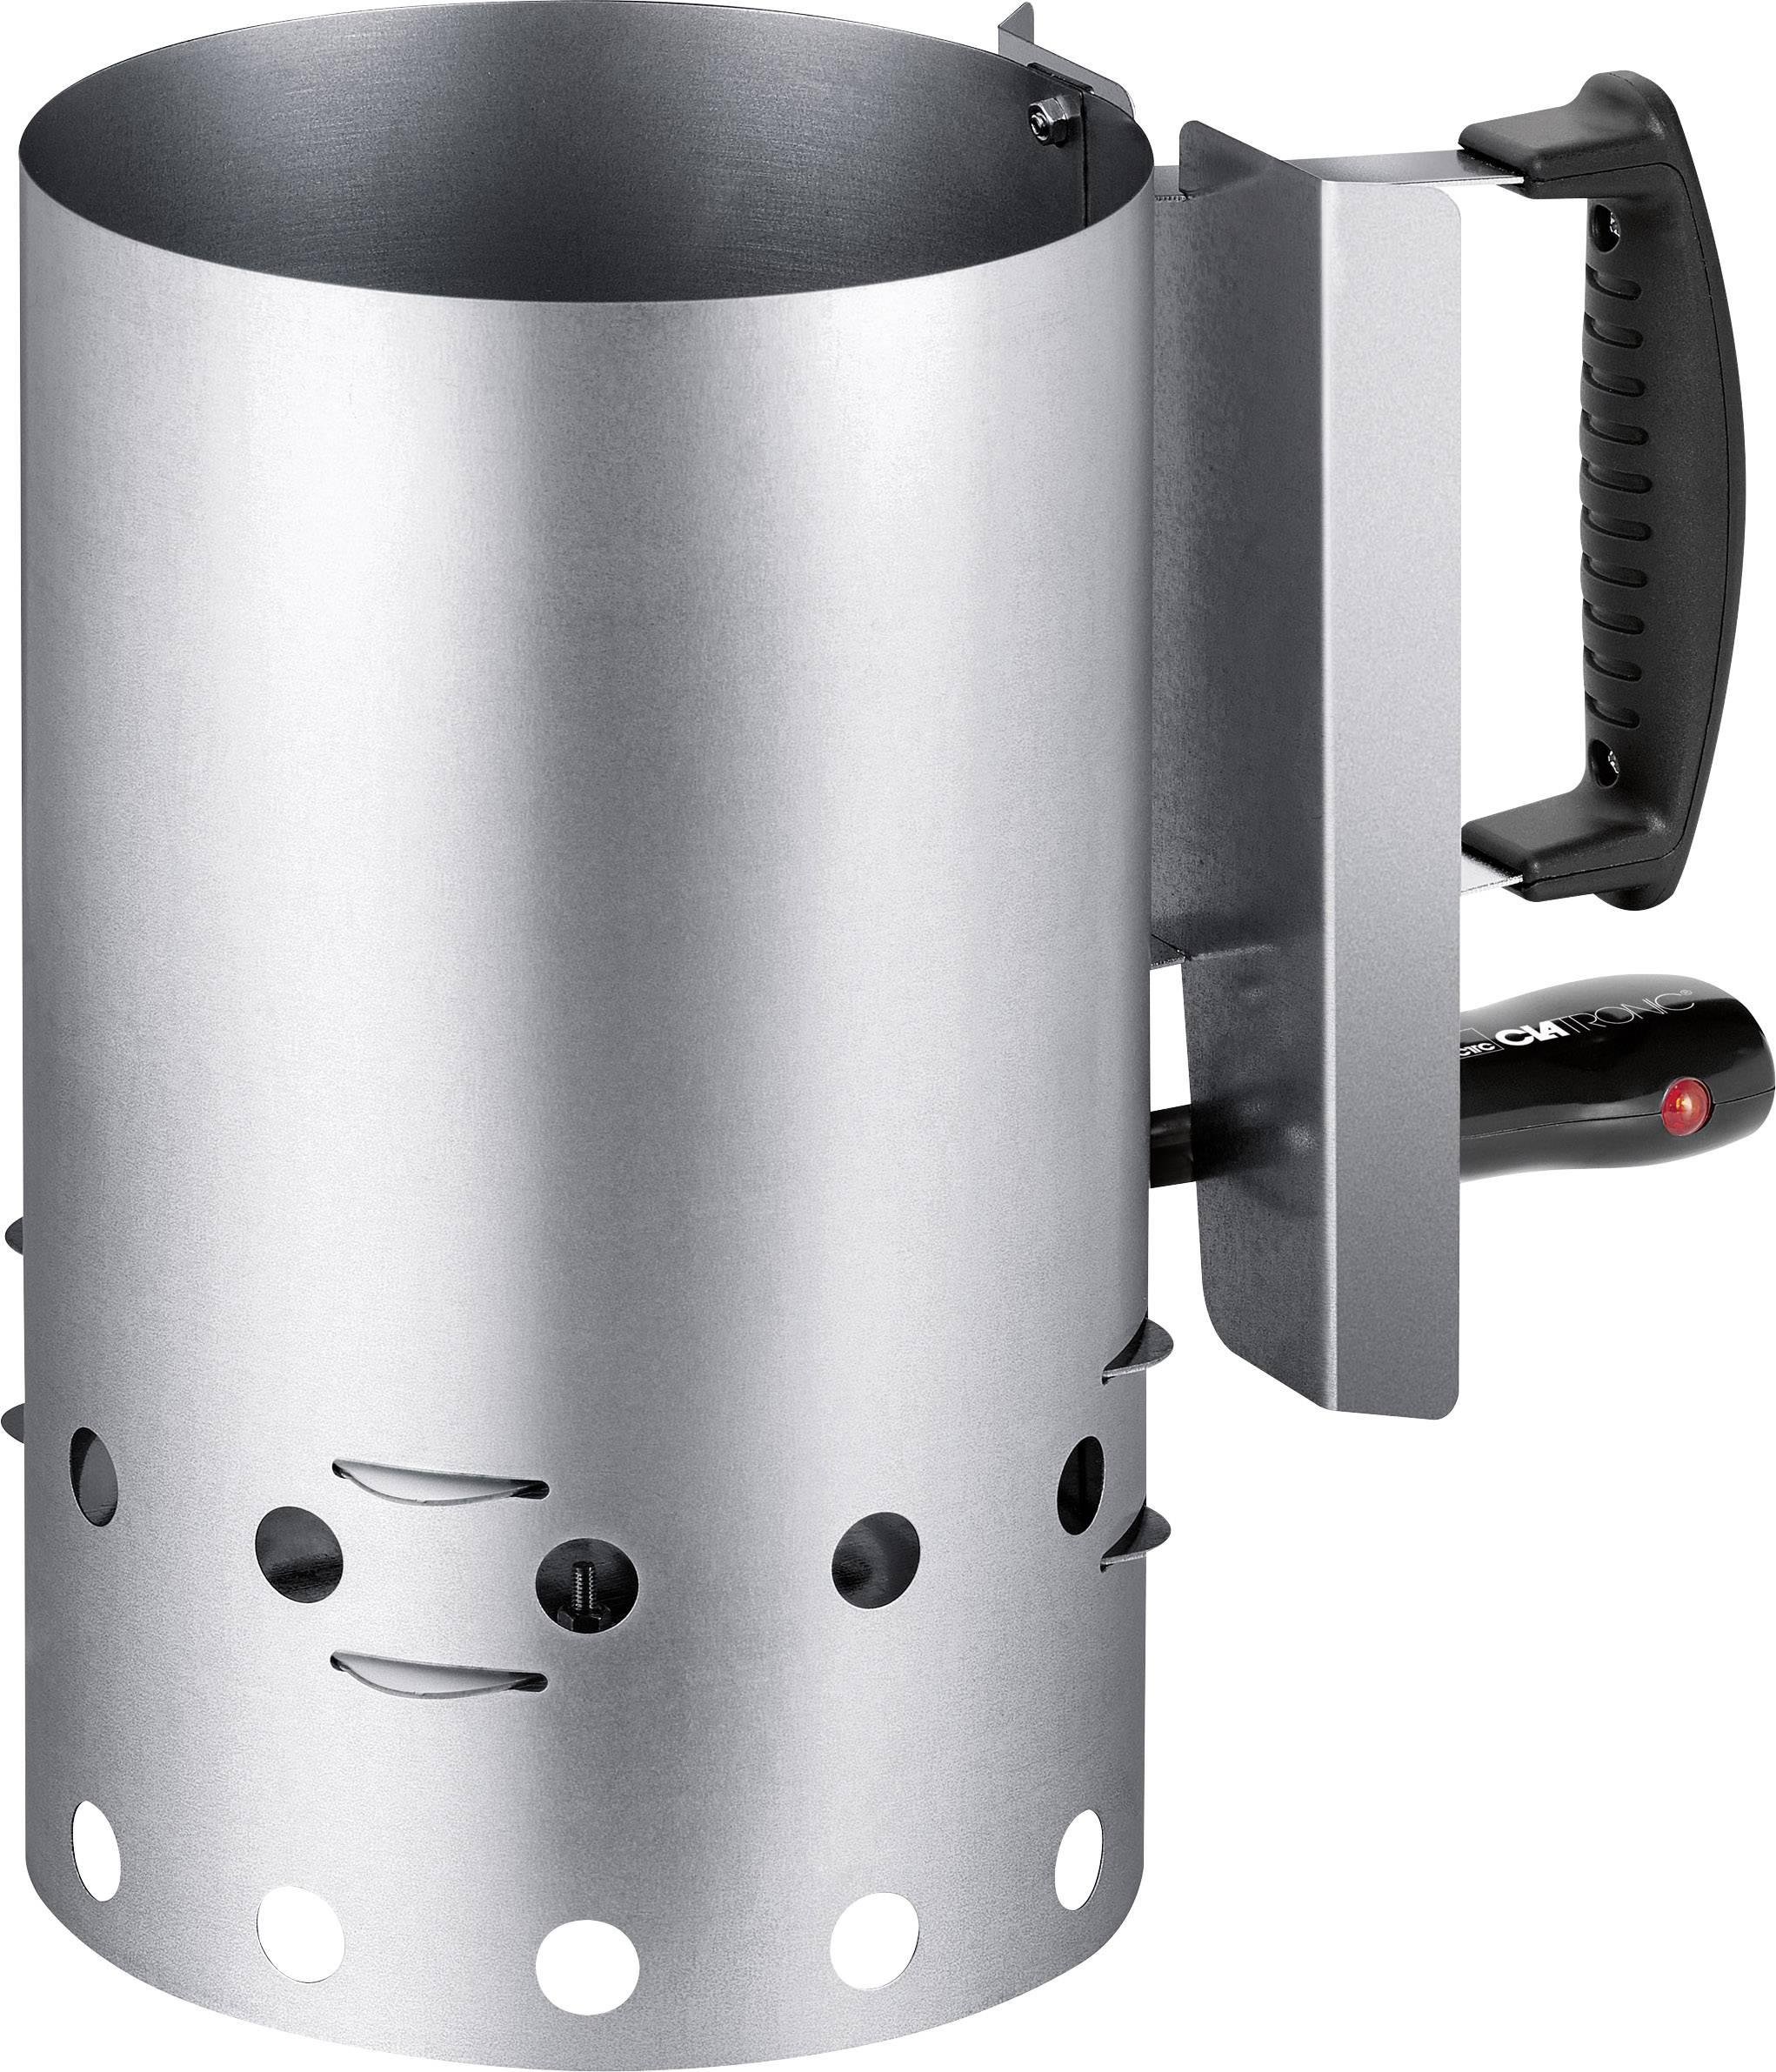 Elektrický zapaľovač grilu Clatronic EGA3662 271723, 600 W